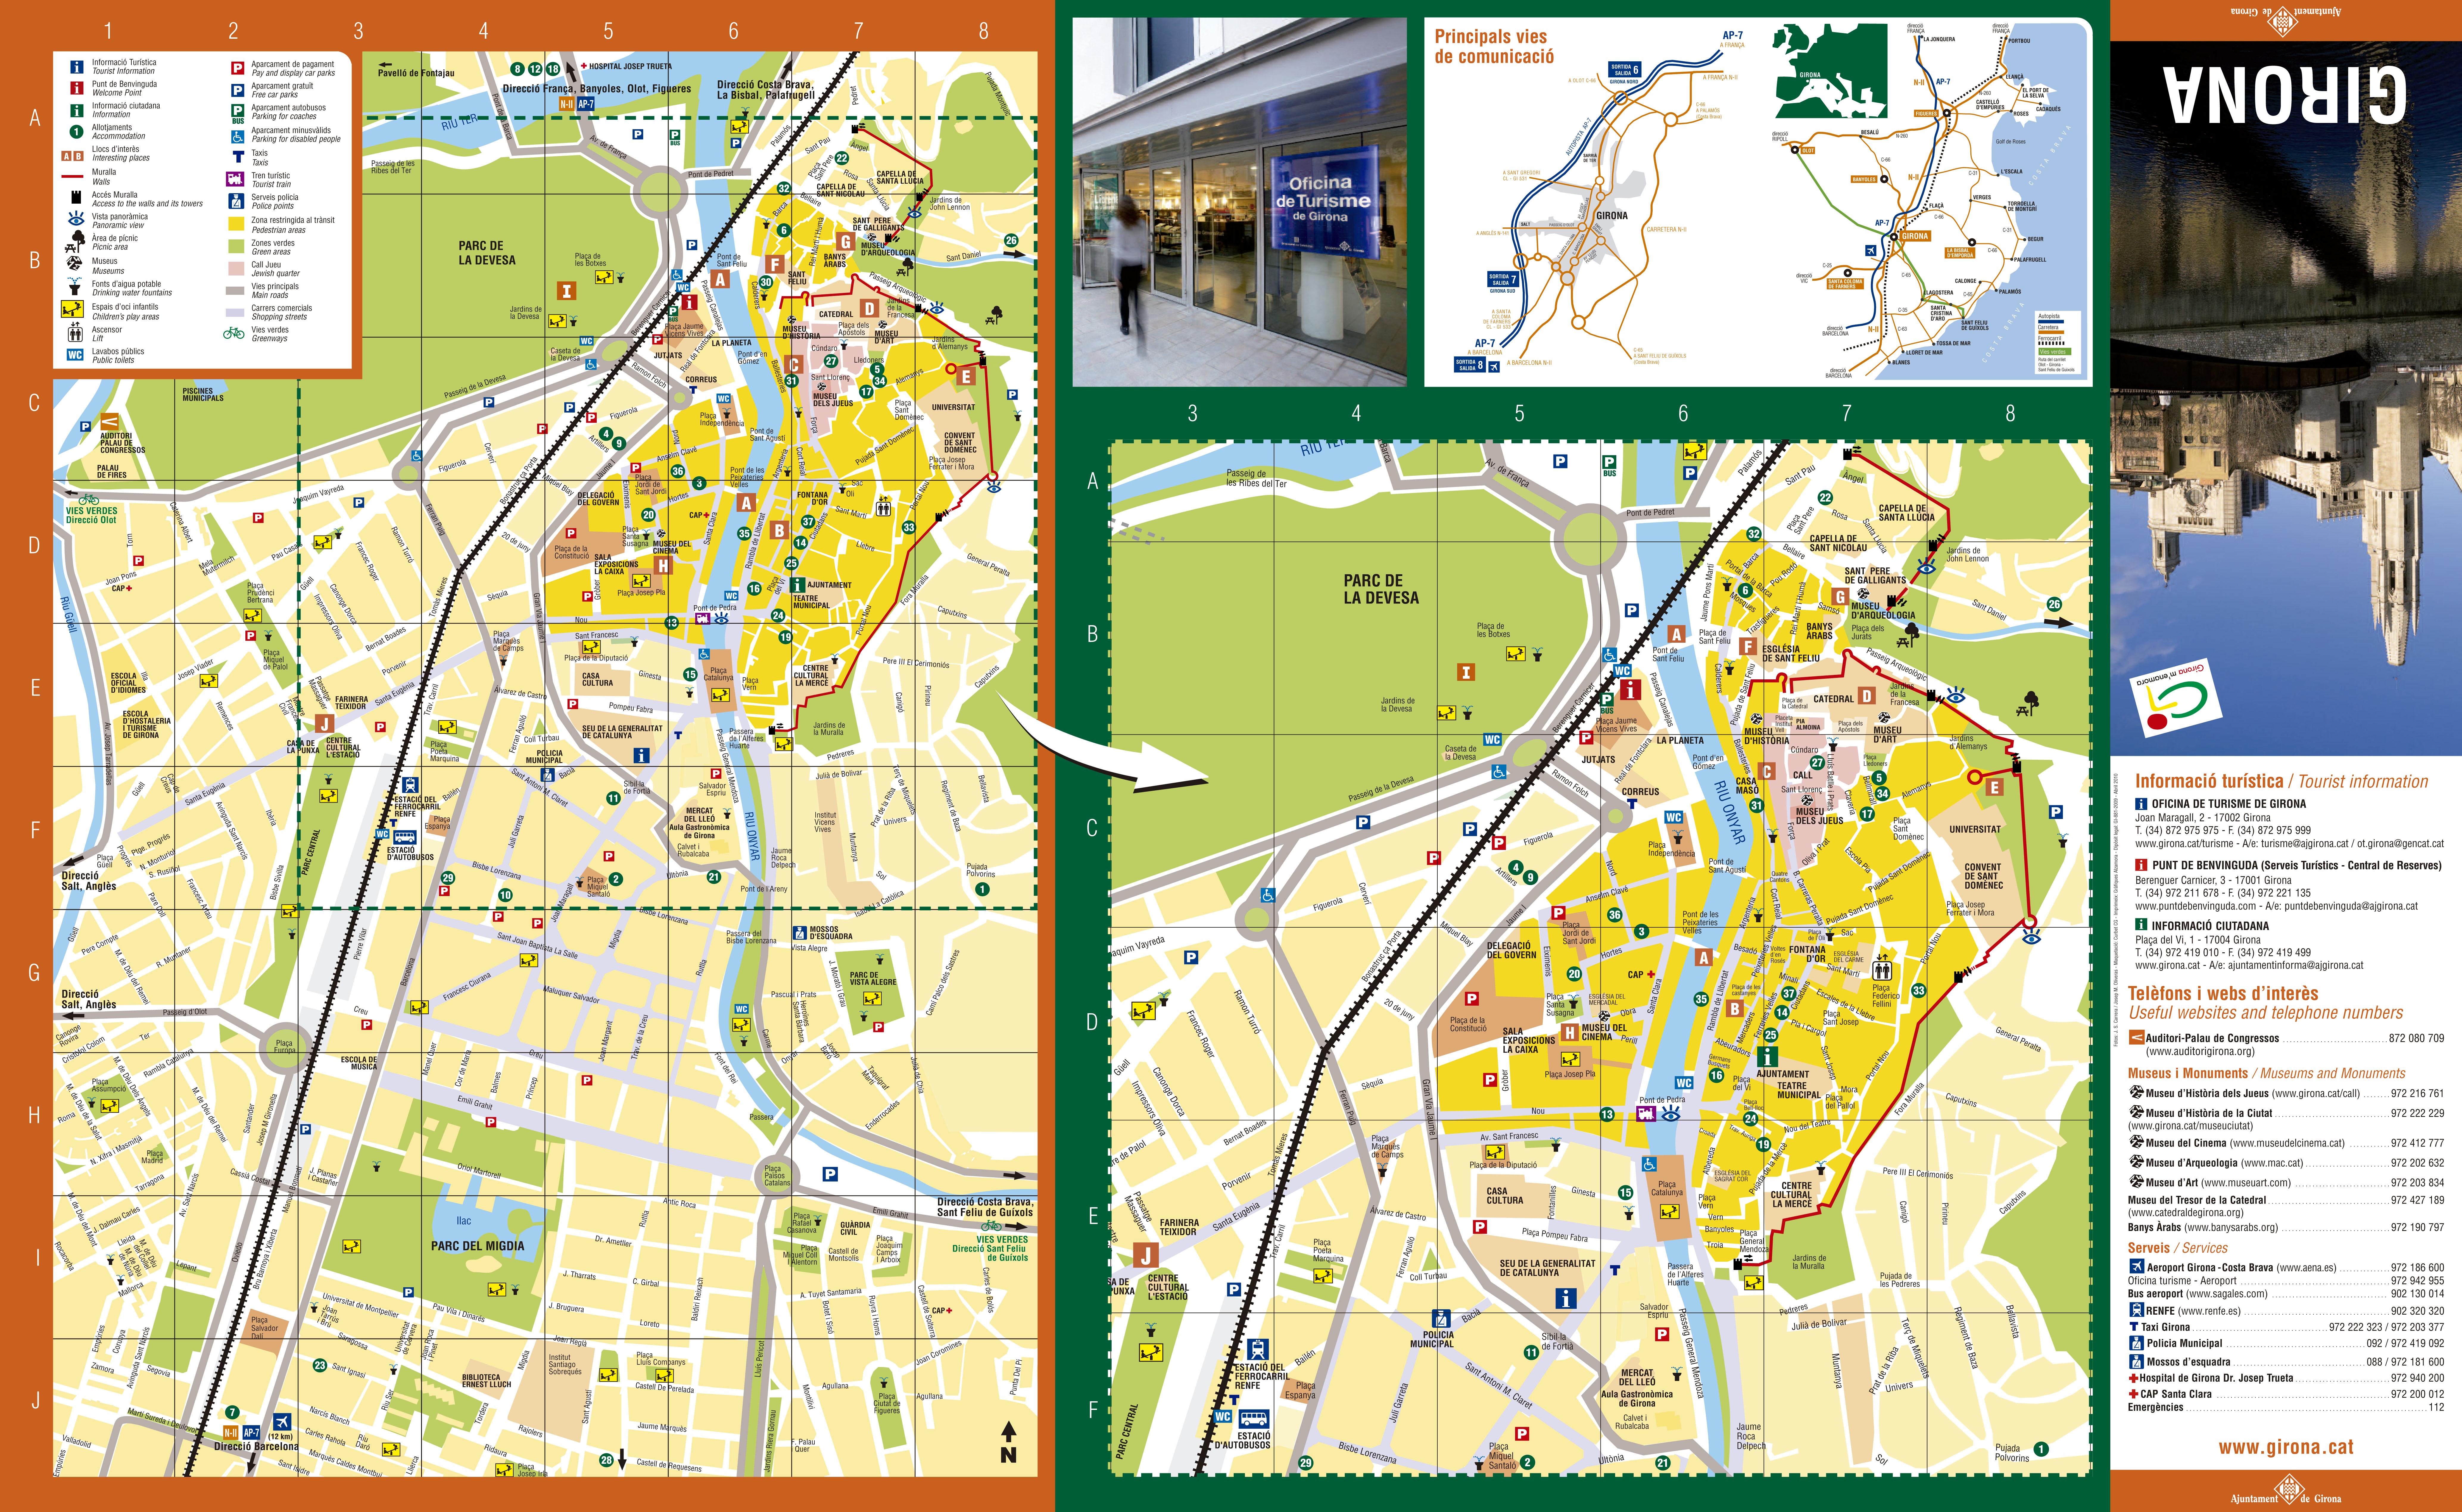 Girona tourist map 2010